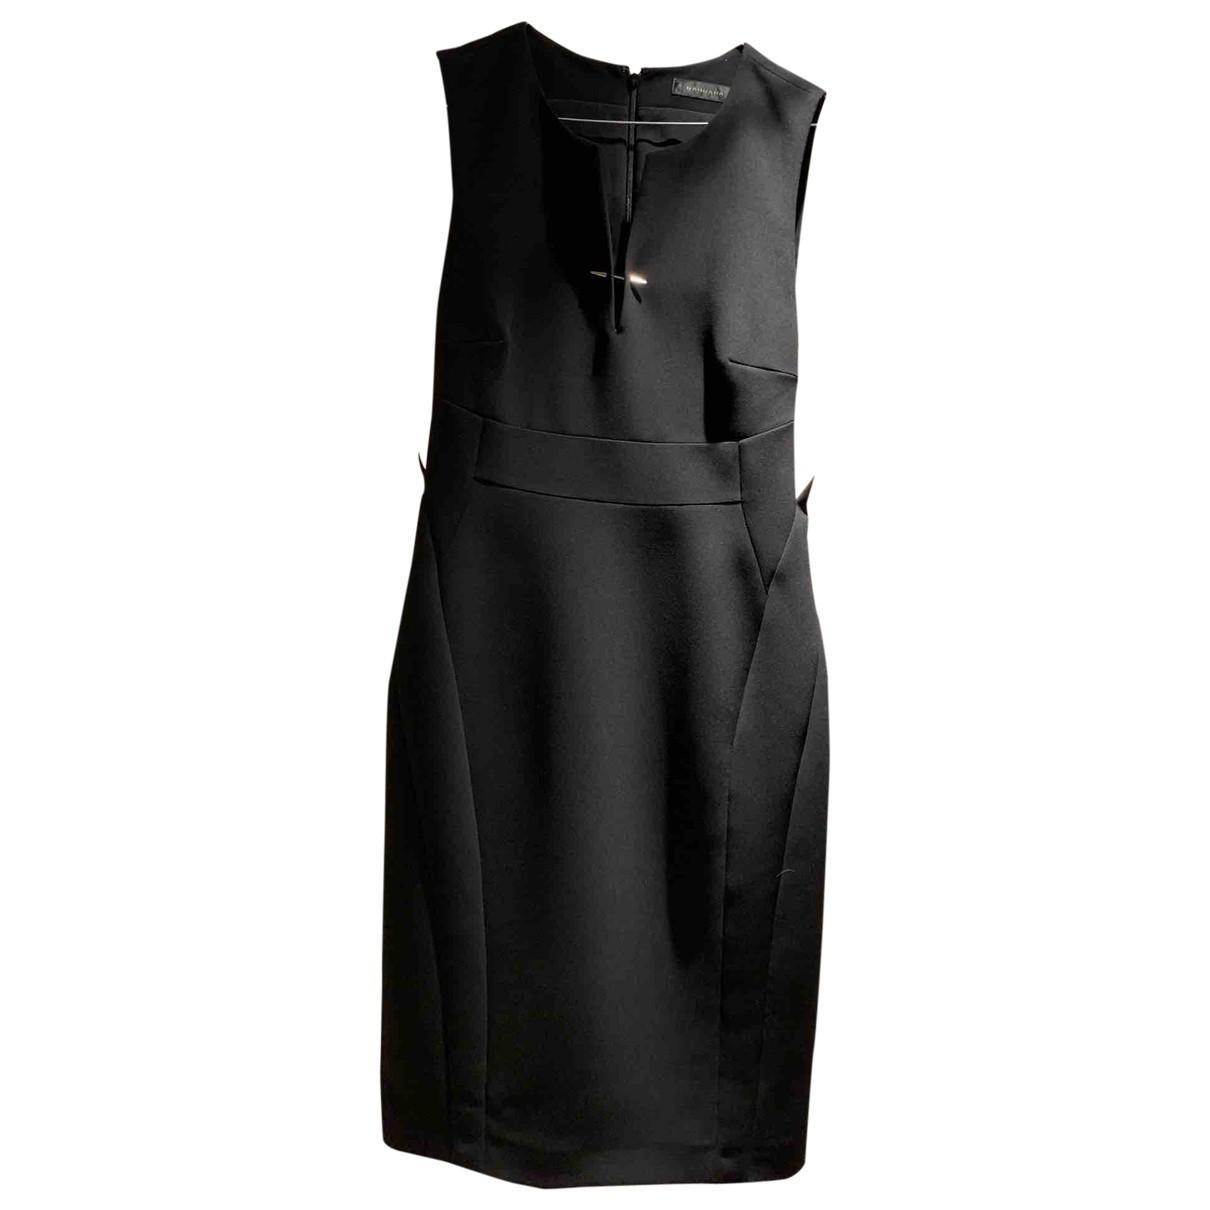 Barbara Bui \N Black dress for Women 40 FR